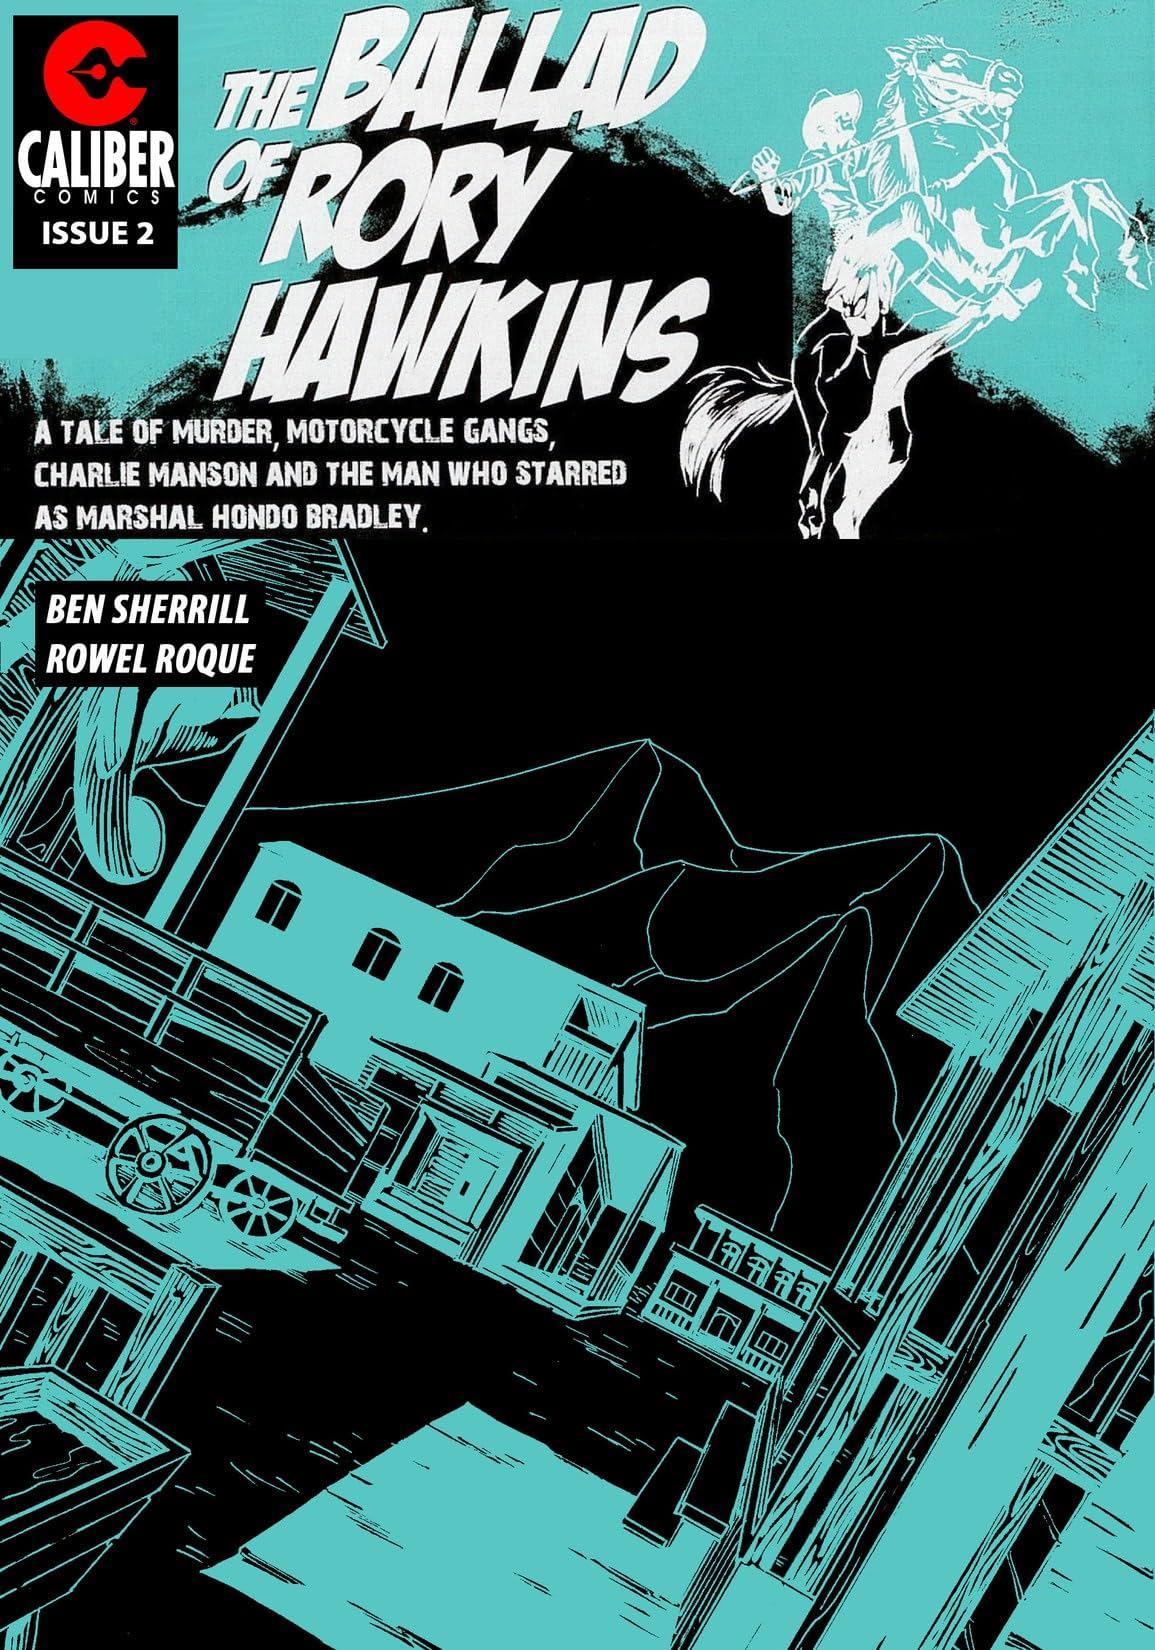 The Ballad of Rory Hawkins #2